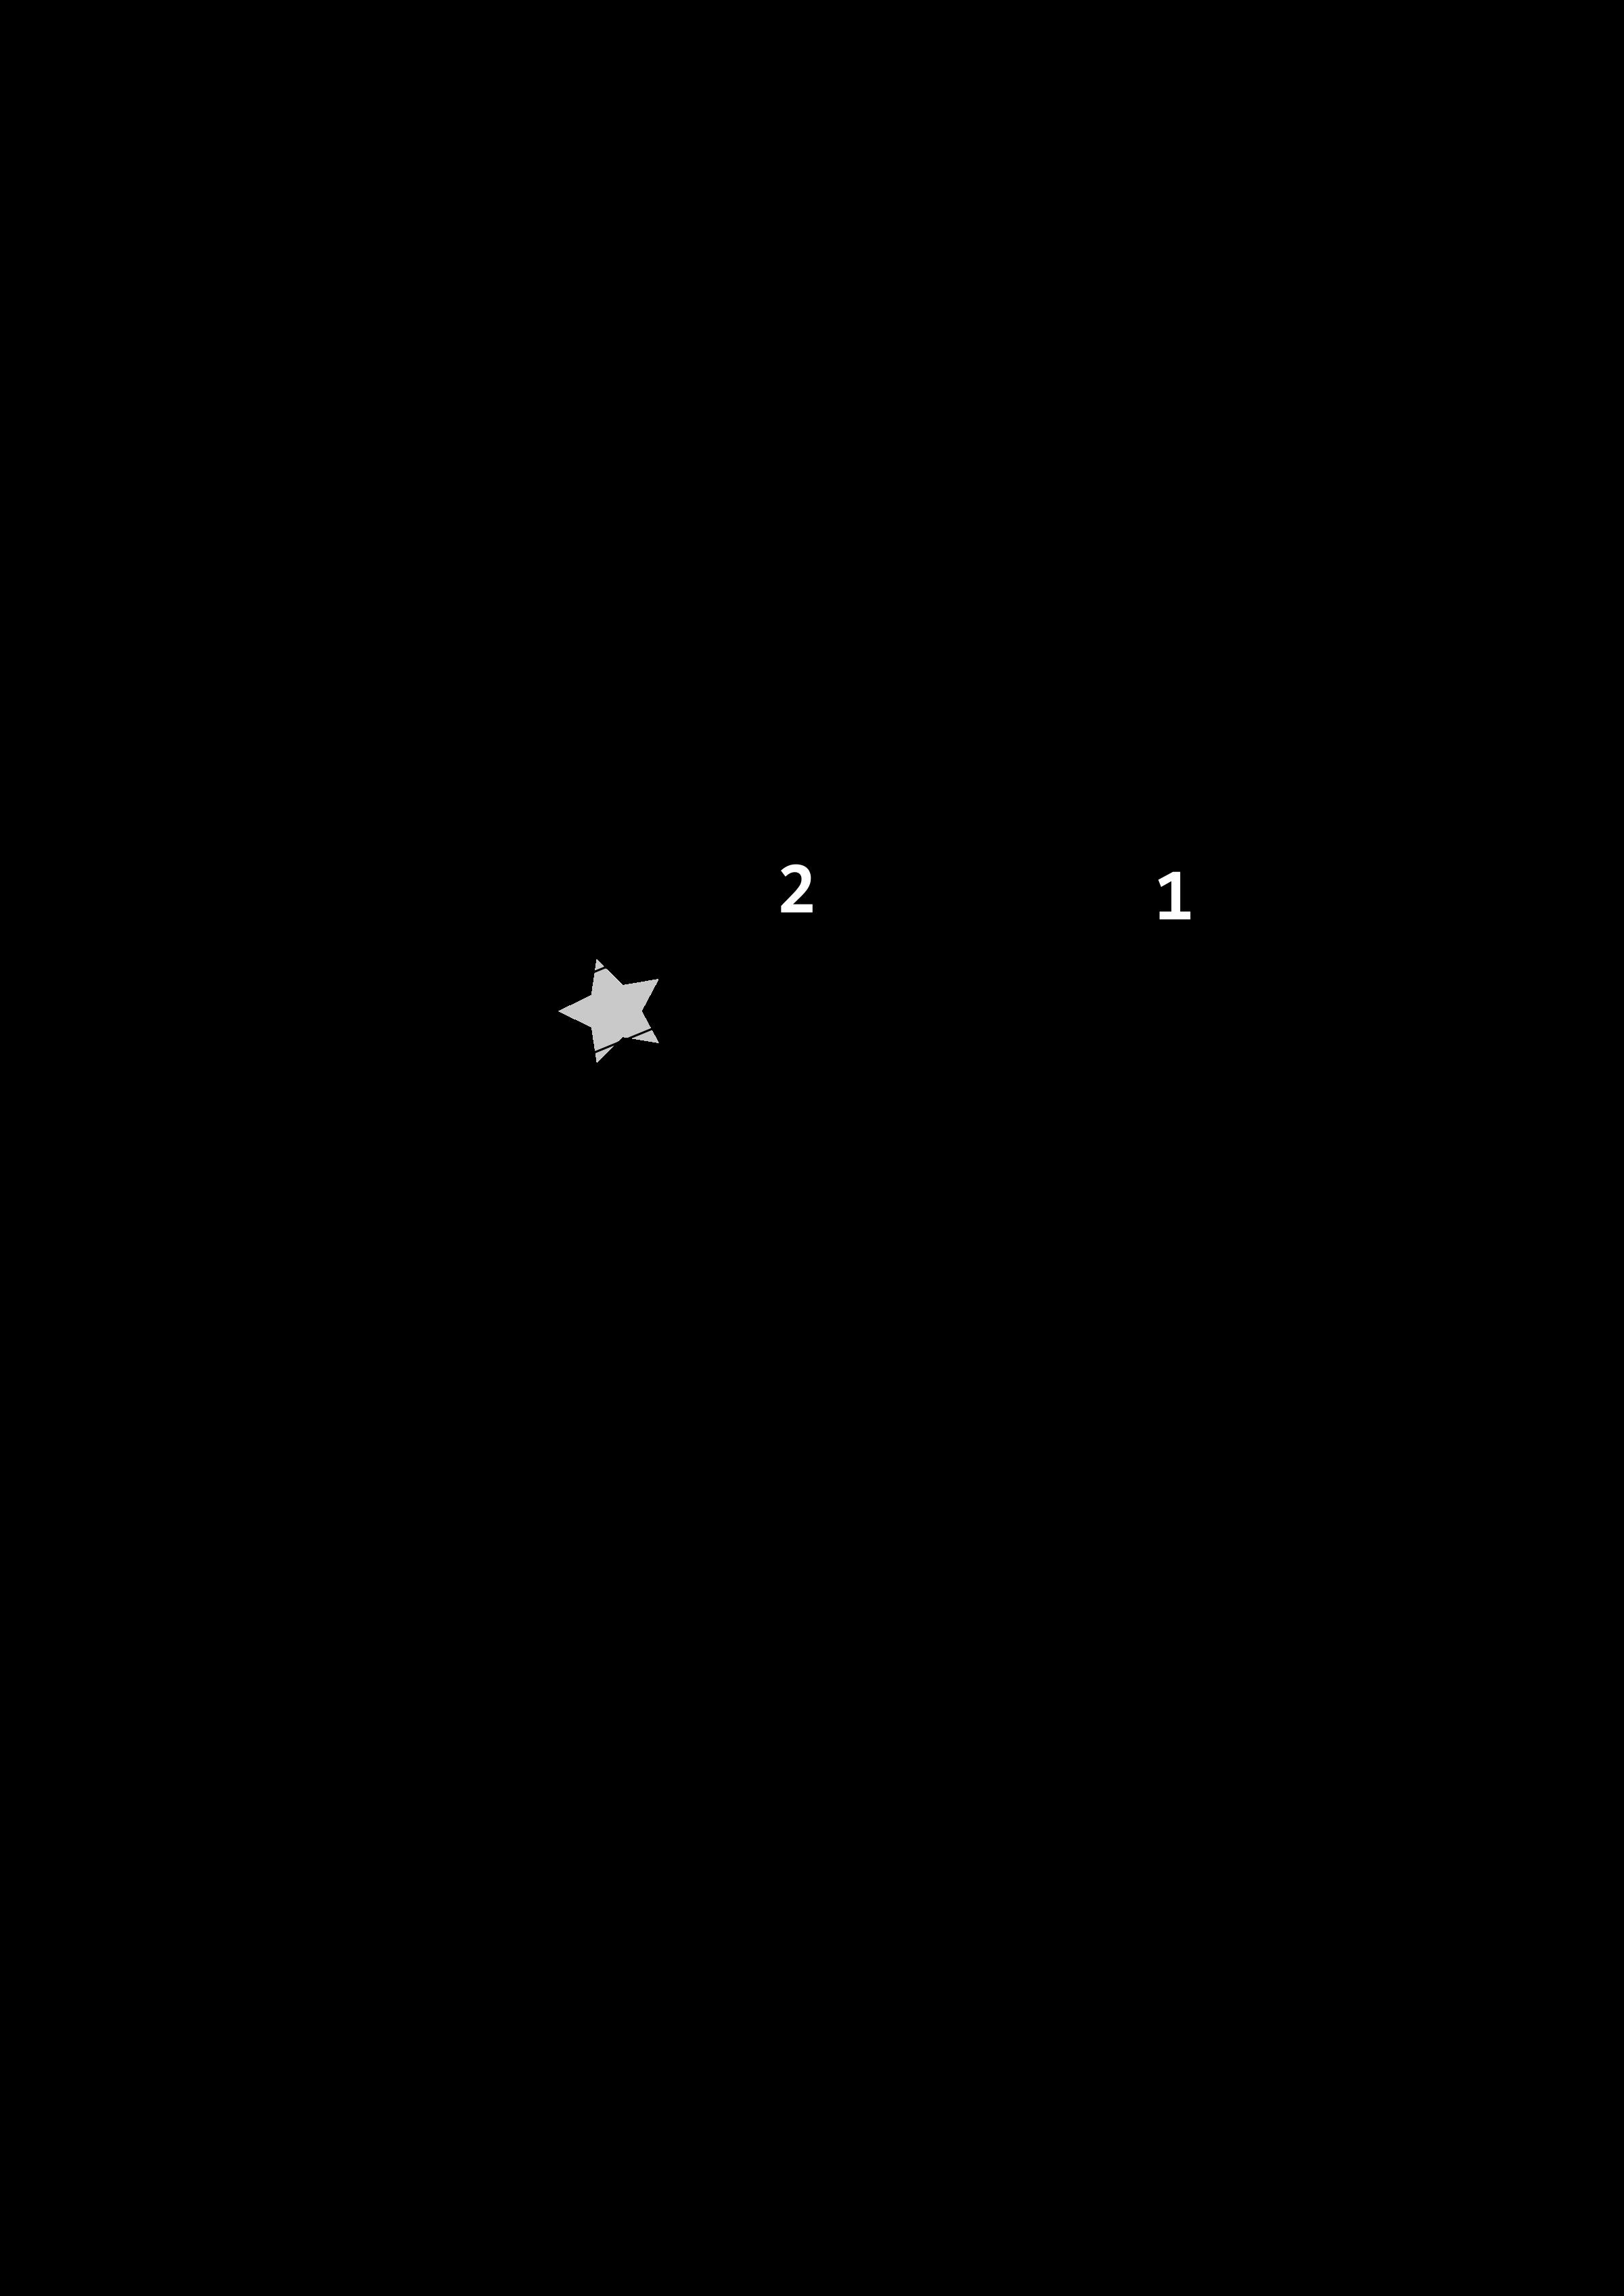 Clipart Open Position Guitar Chord Am7